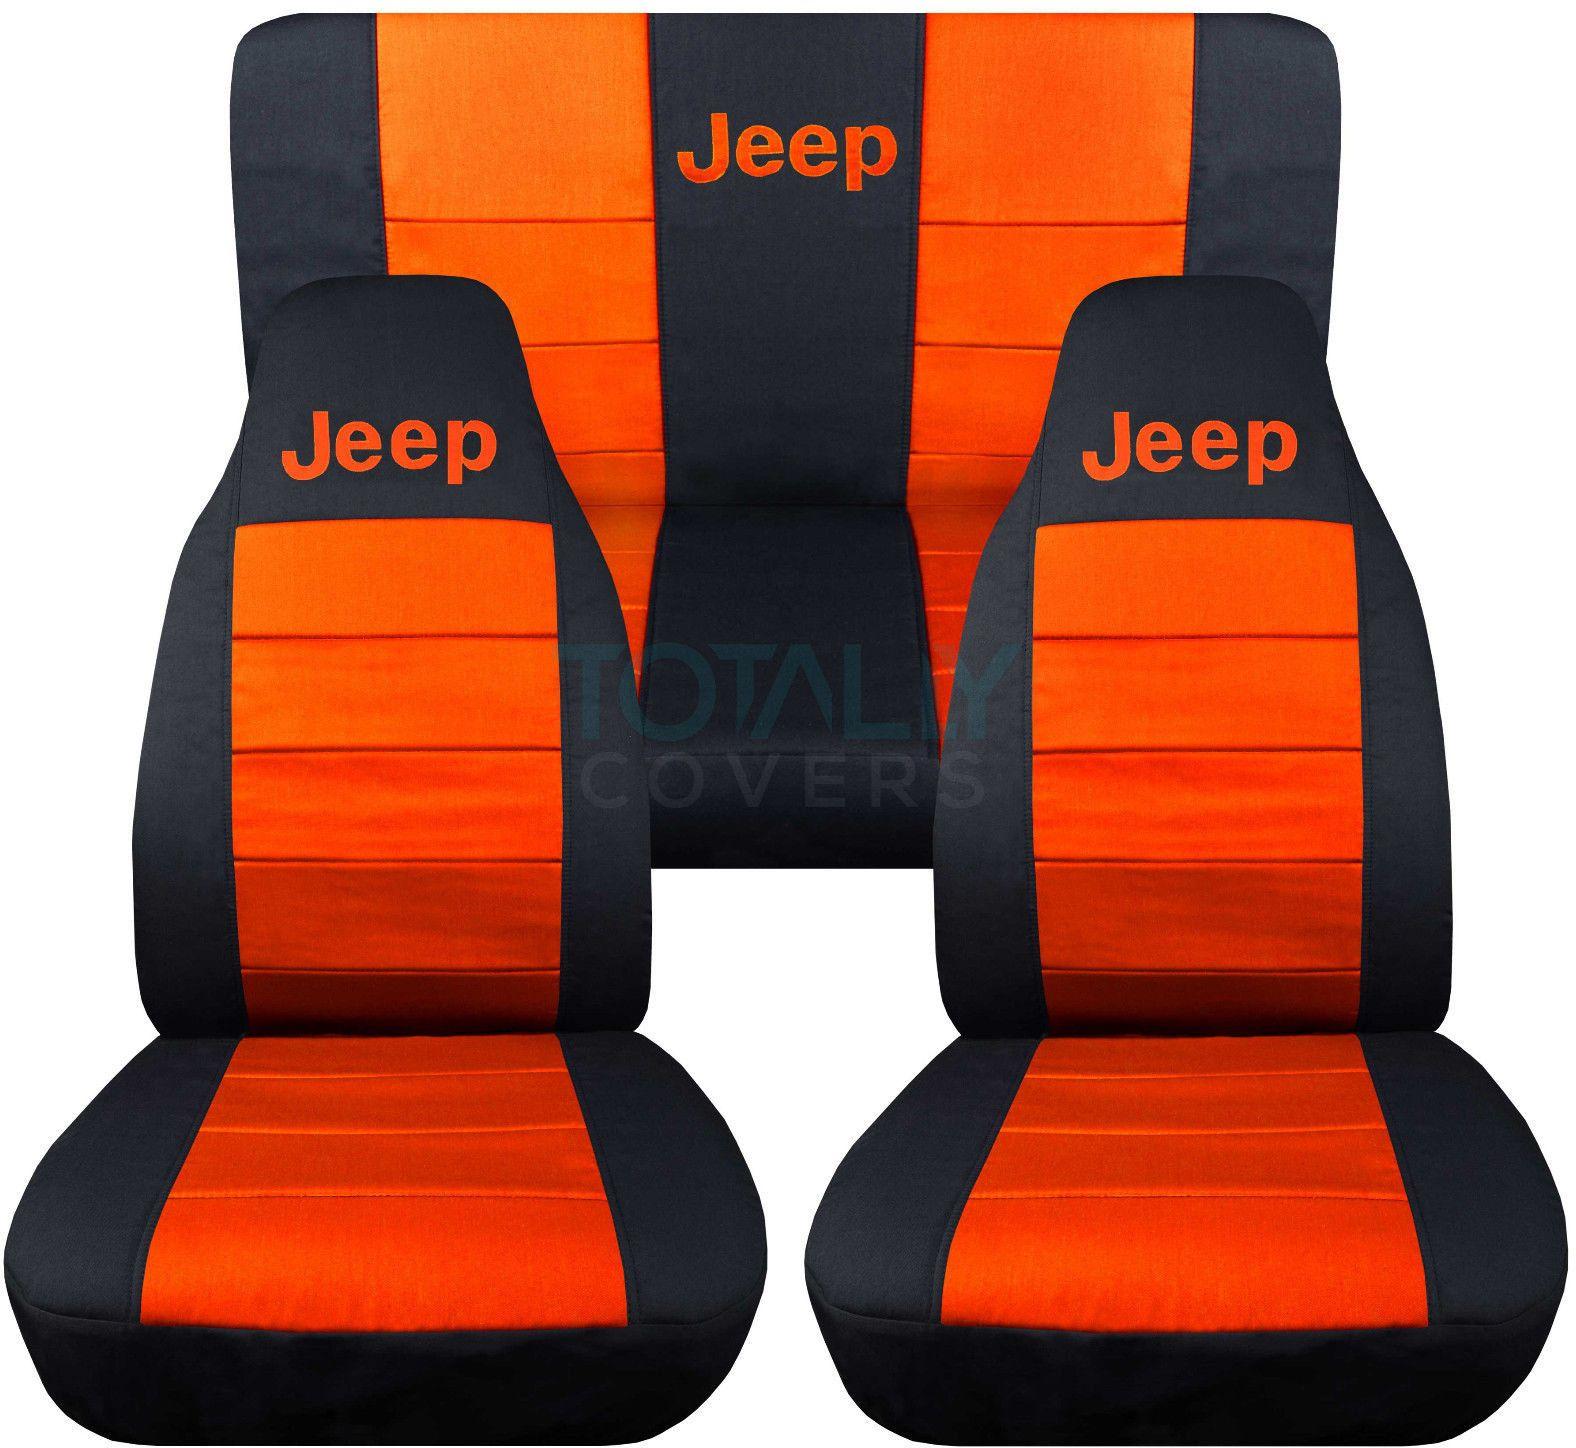 Jeep Wrangler Black and Orange Jeep Logo Seat Covers.